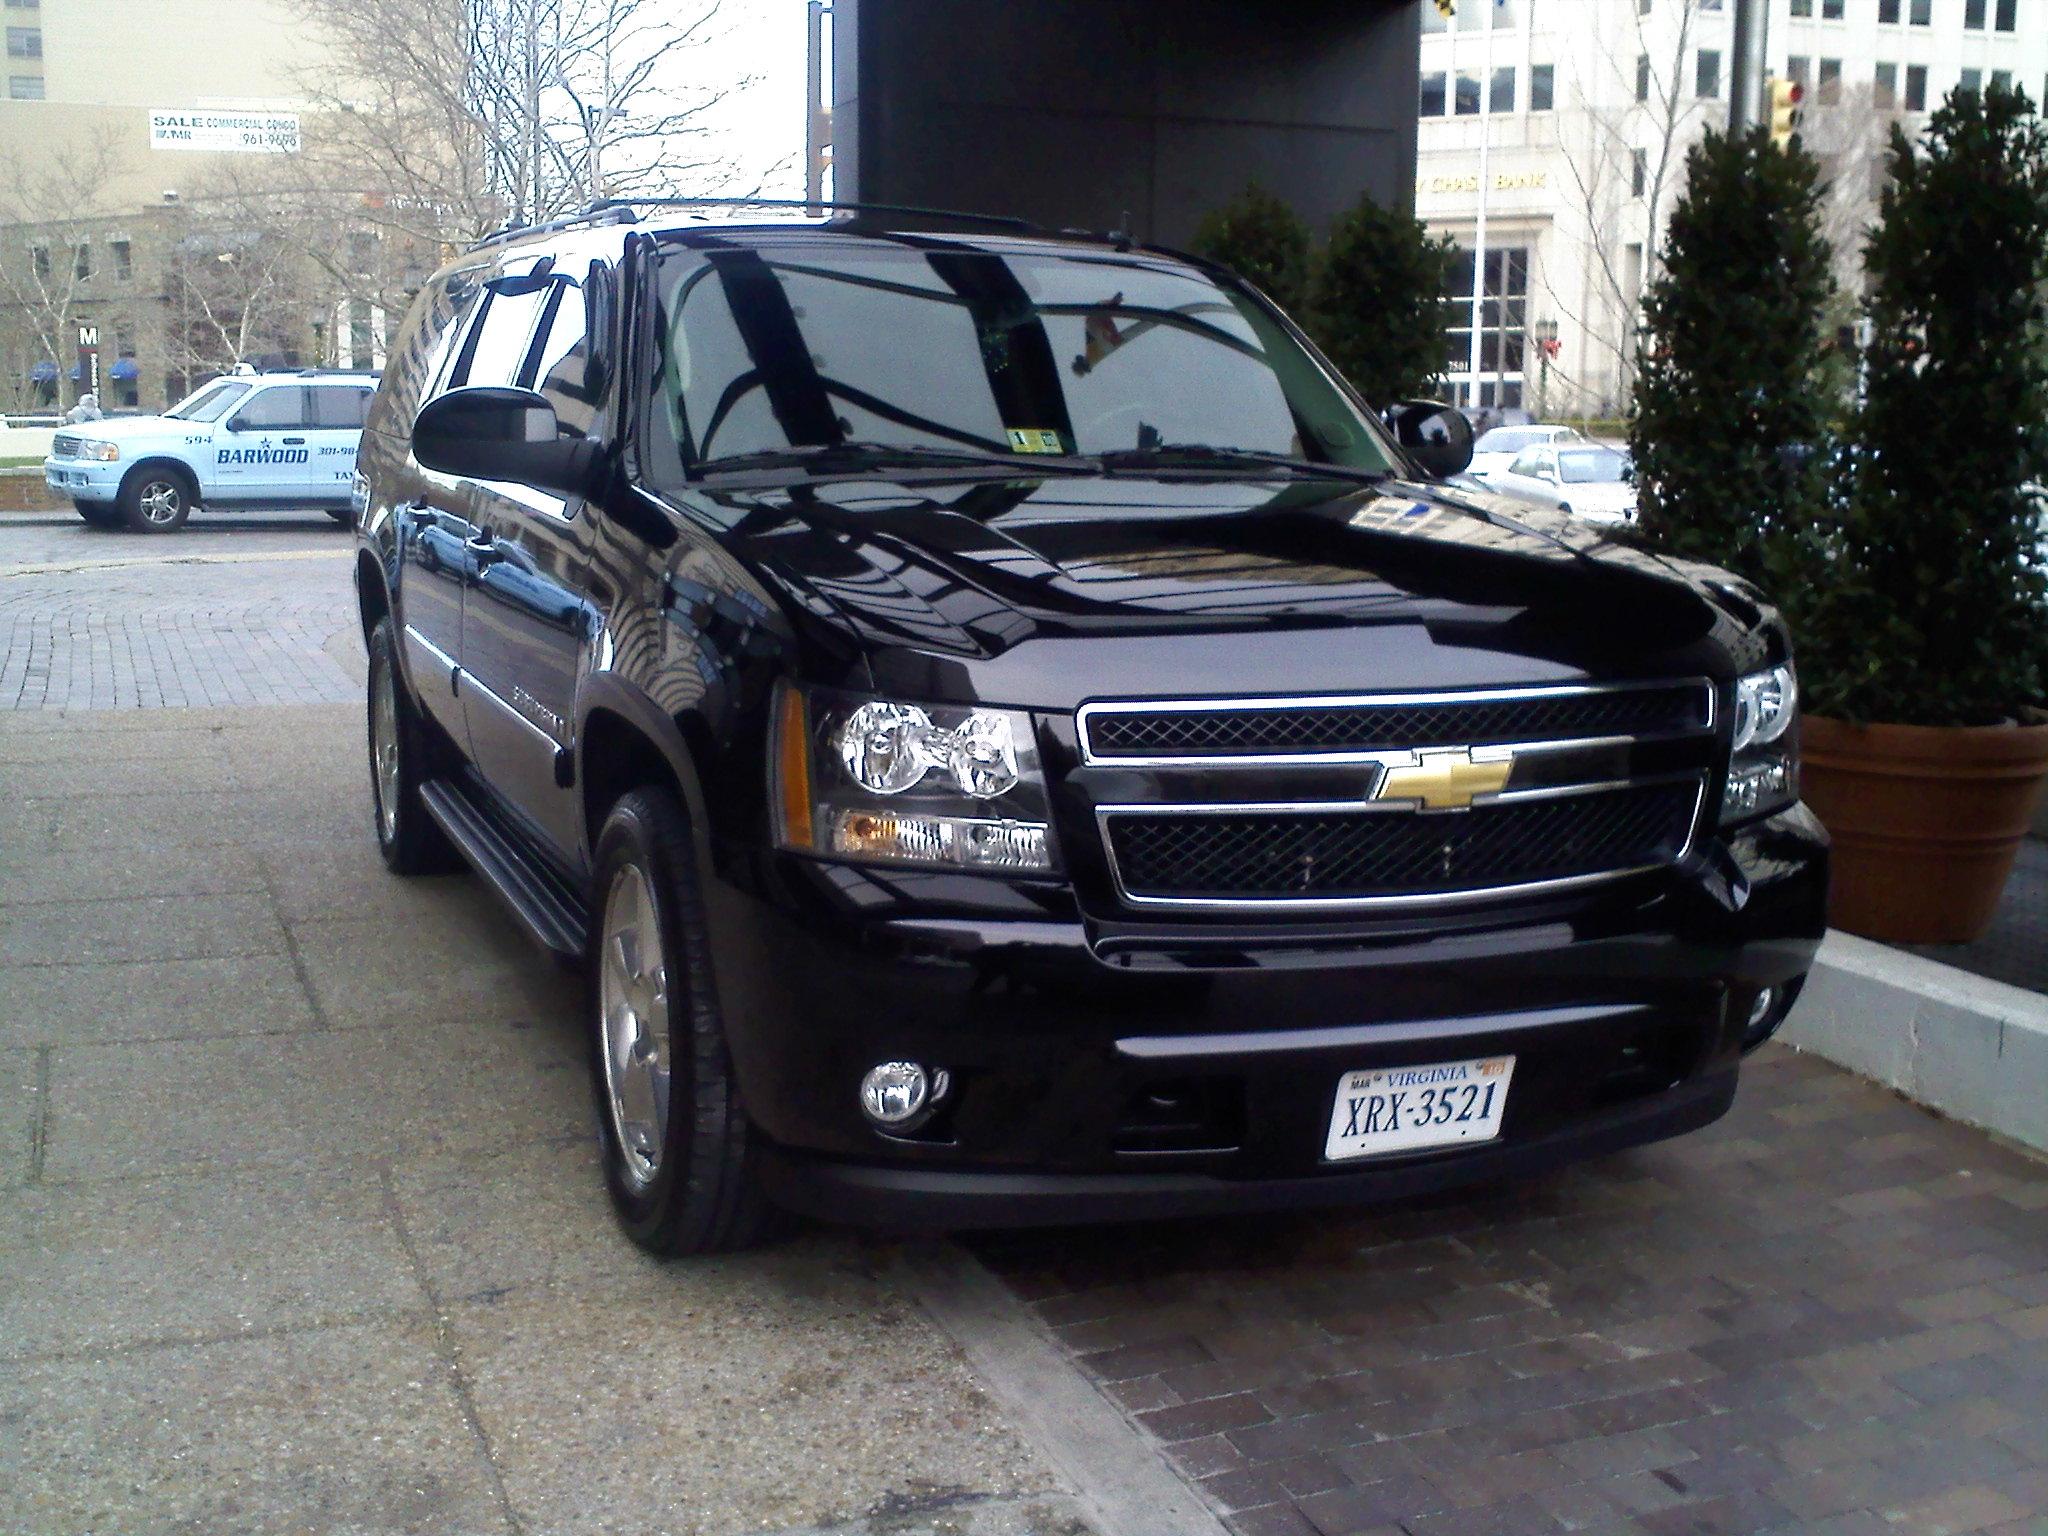 Luxury SUVs | Awards Limousine Service, Inc. - Greater ...